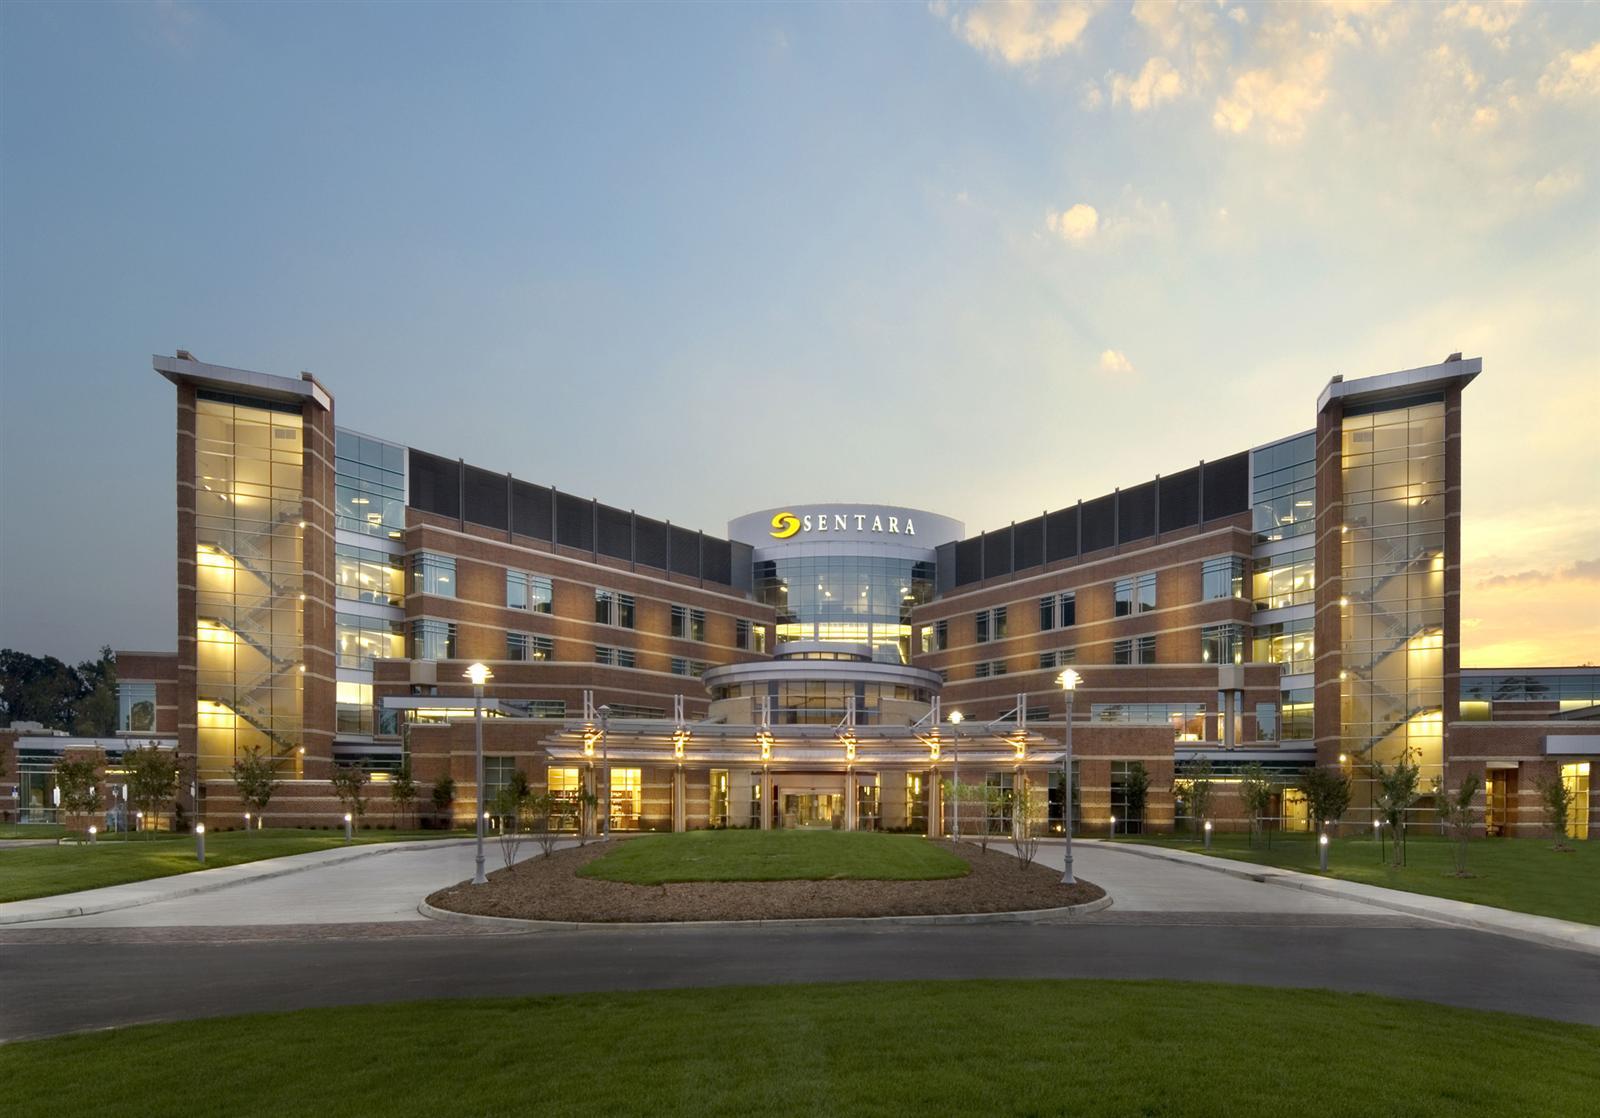 sentara-williamsburg-regional-medical-center